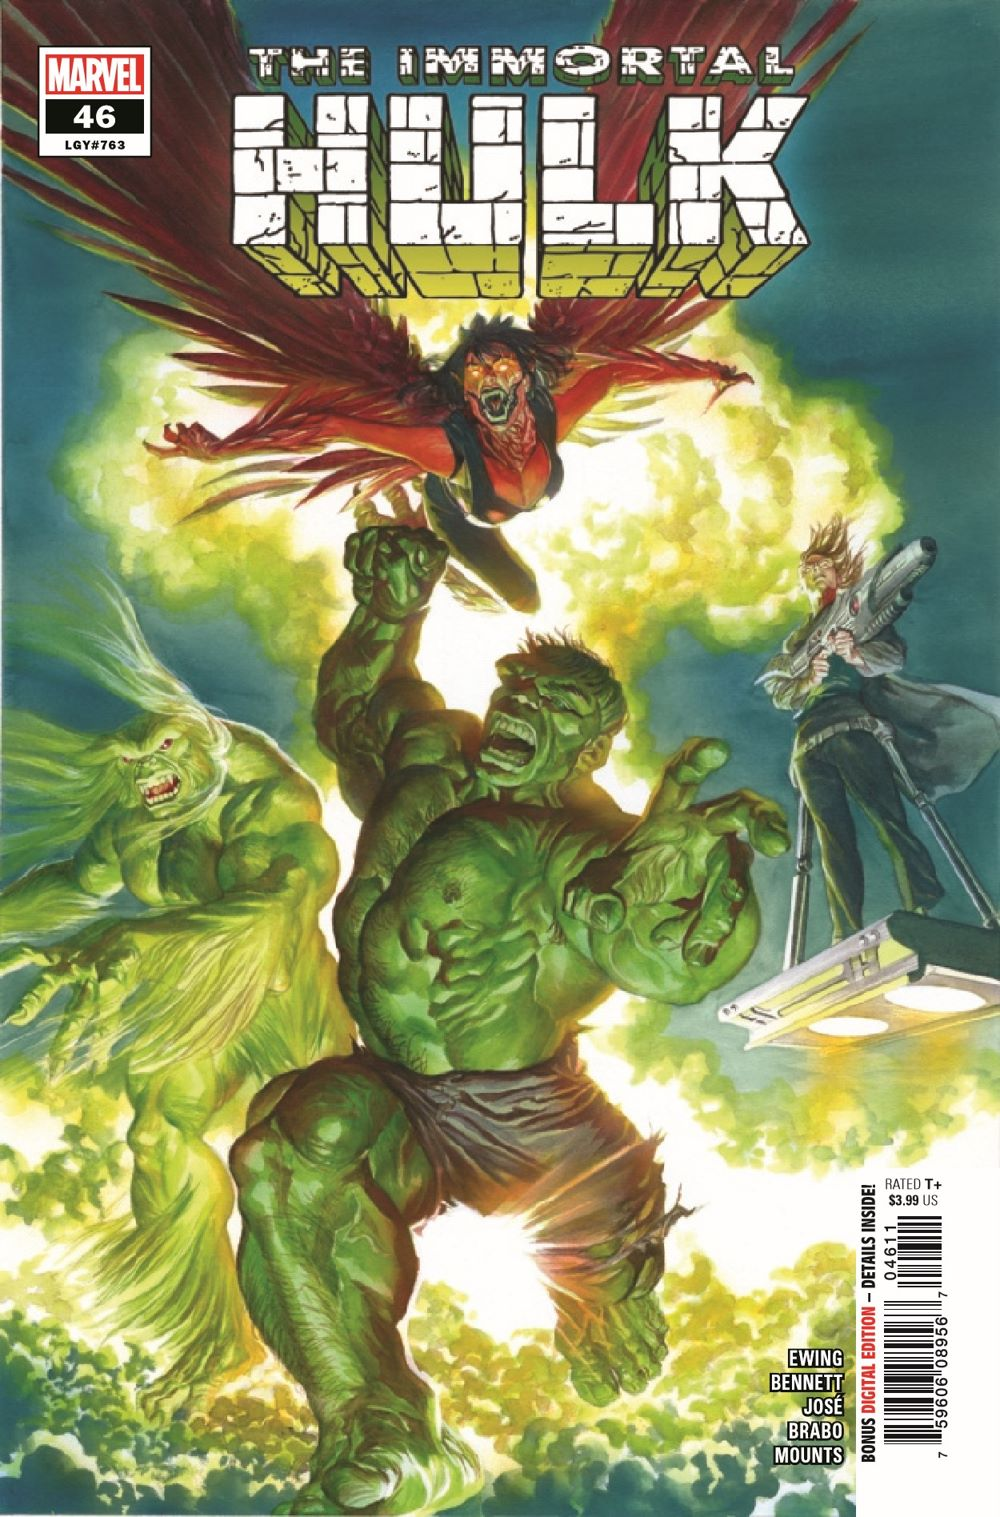 HULK2018046_Preview-1 ComicList Previews: THE IMMORTAL HULK #46